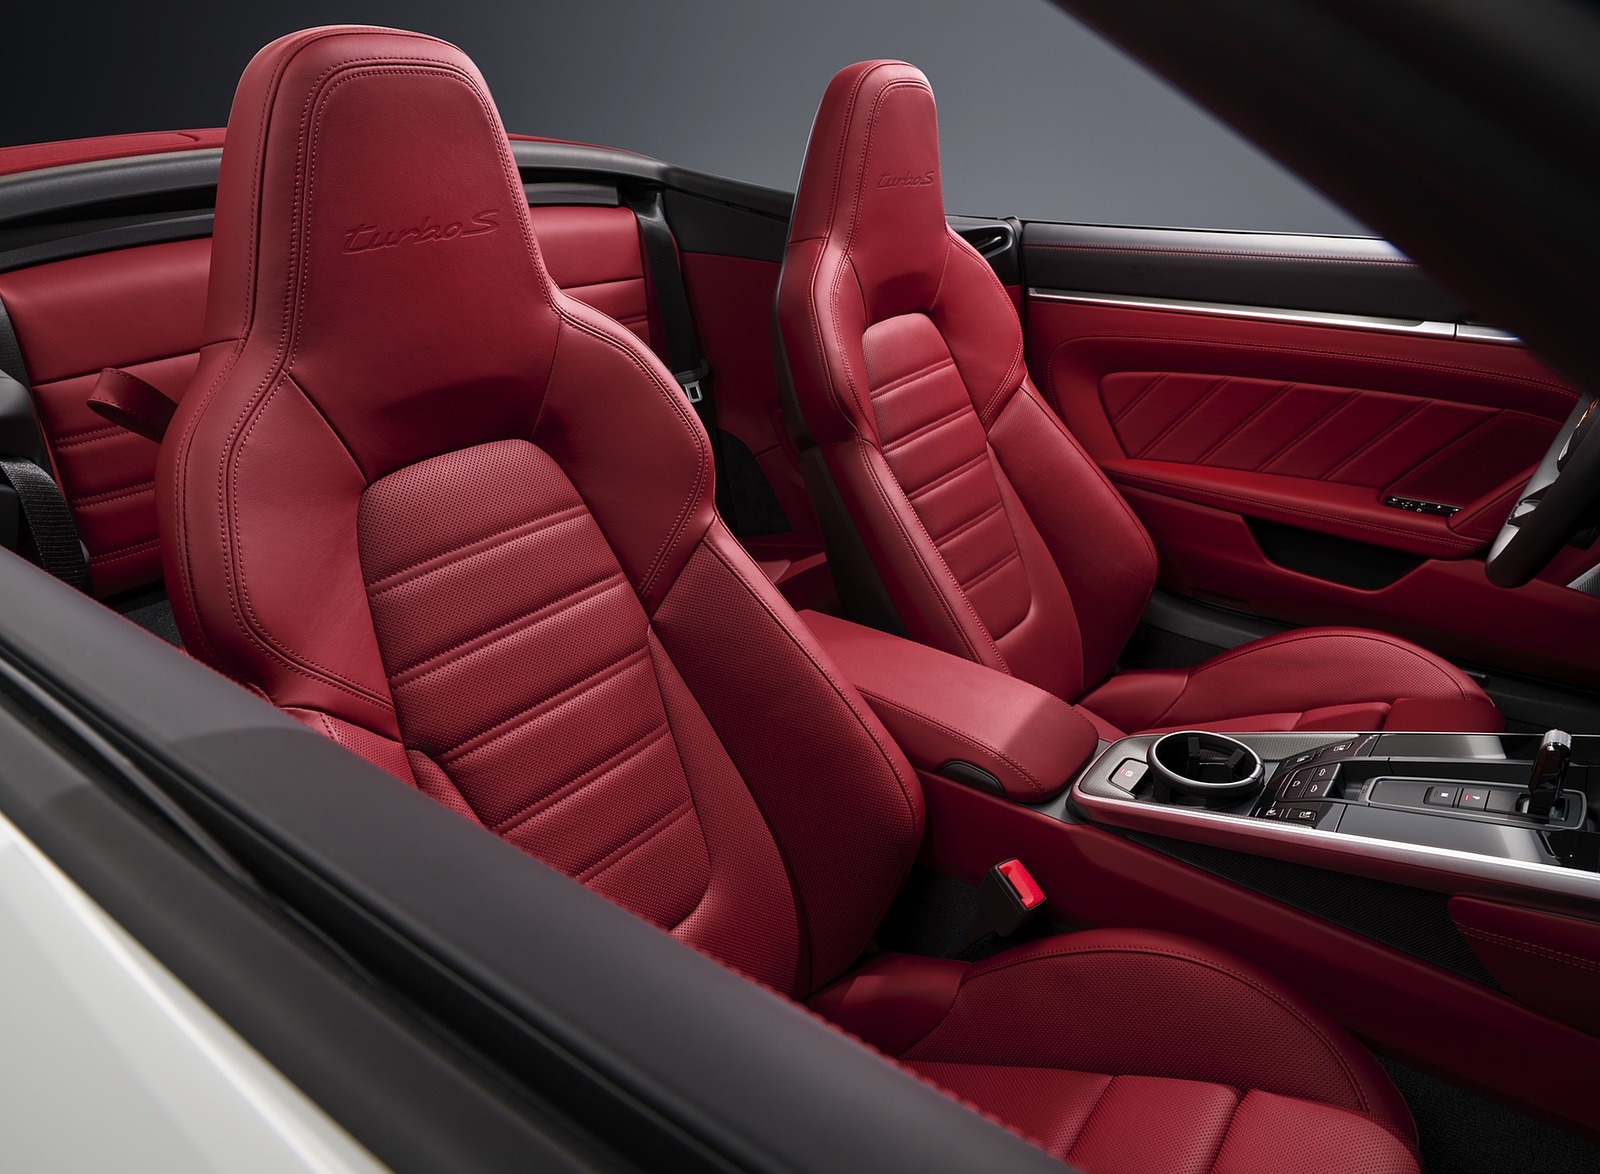 2021 Porsche 911 Turbo S Cabriolet Interior Seats Wallpapers (7)